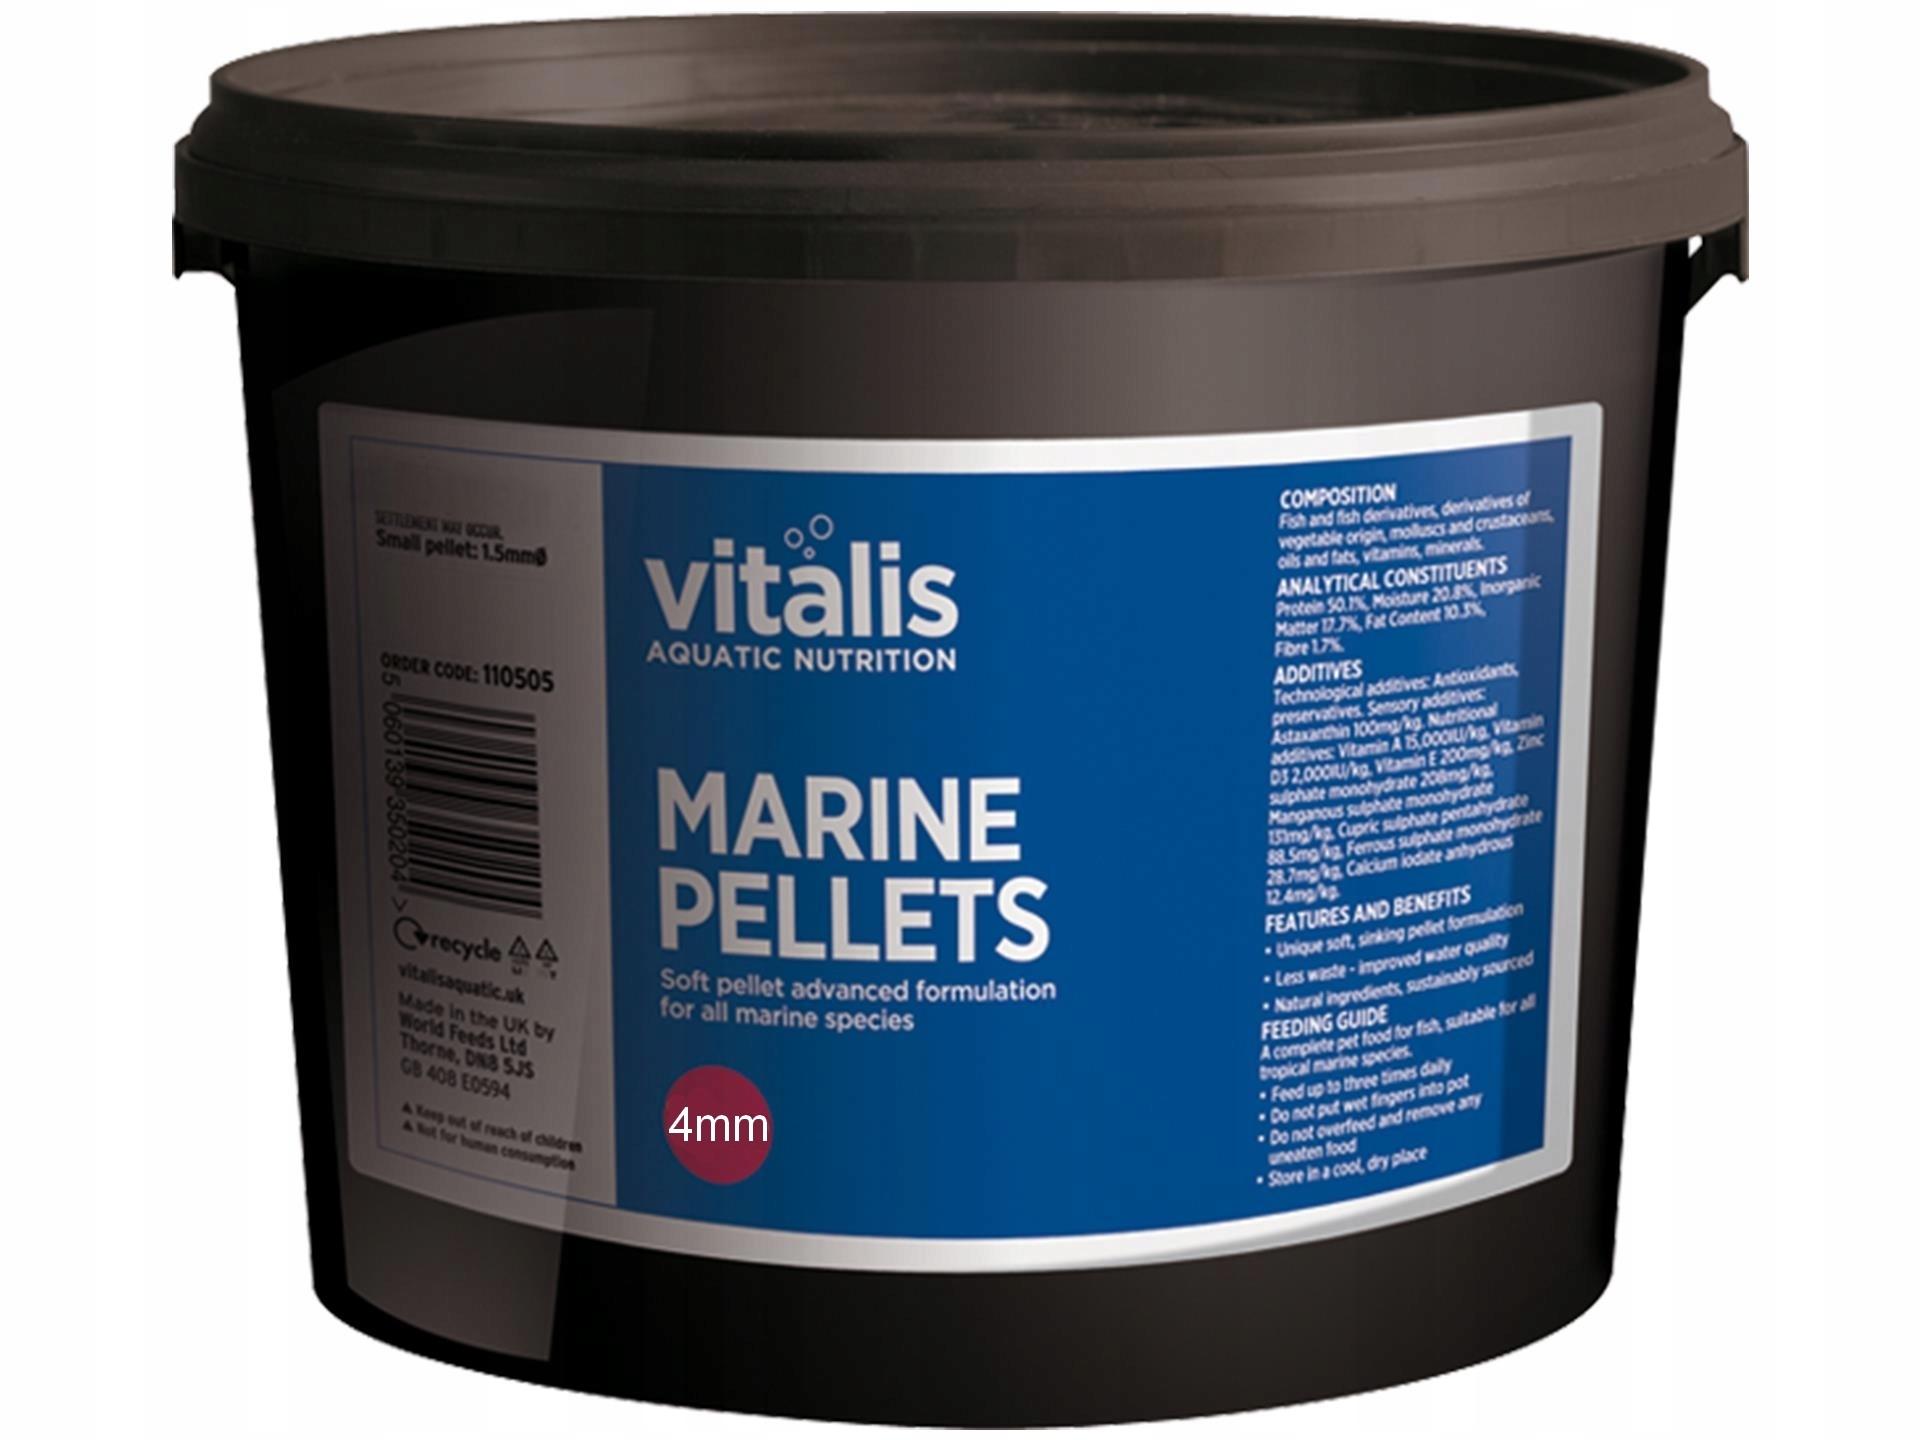 VITALIS MORSKÝCH S PELIET 4 mm, 20 kg Potravín